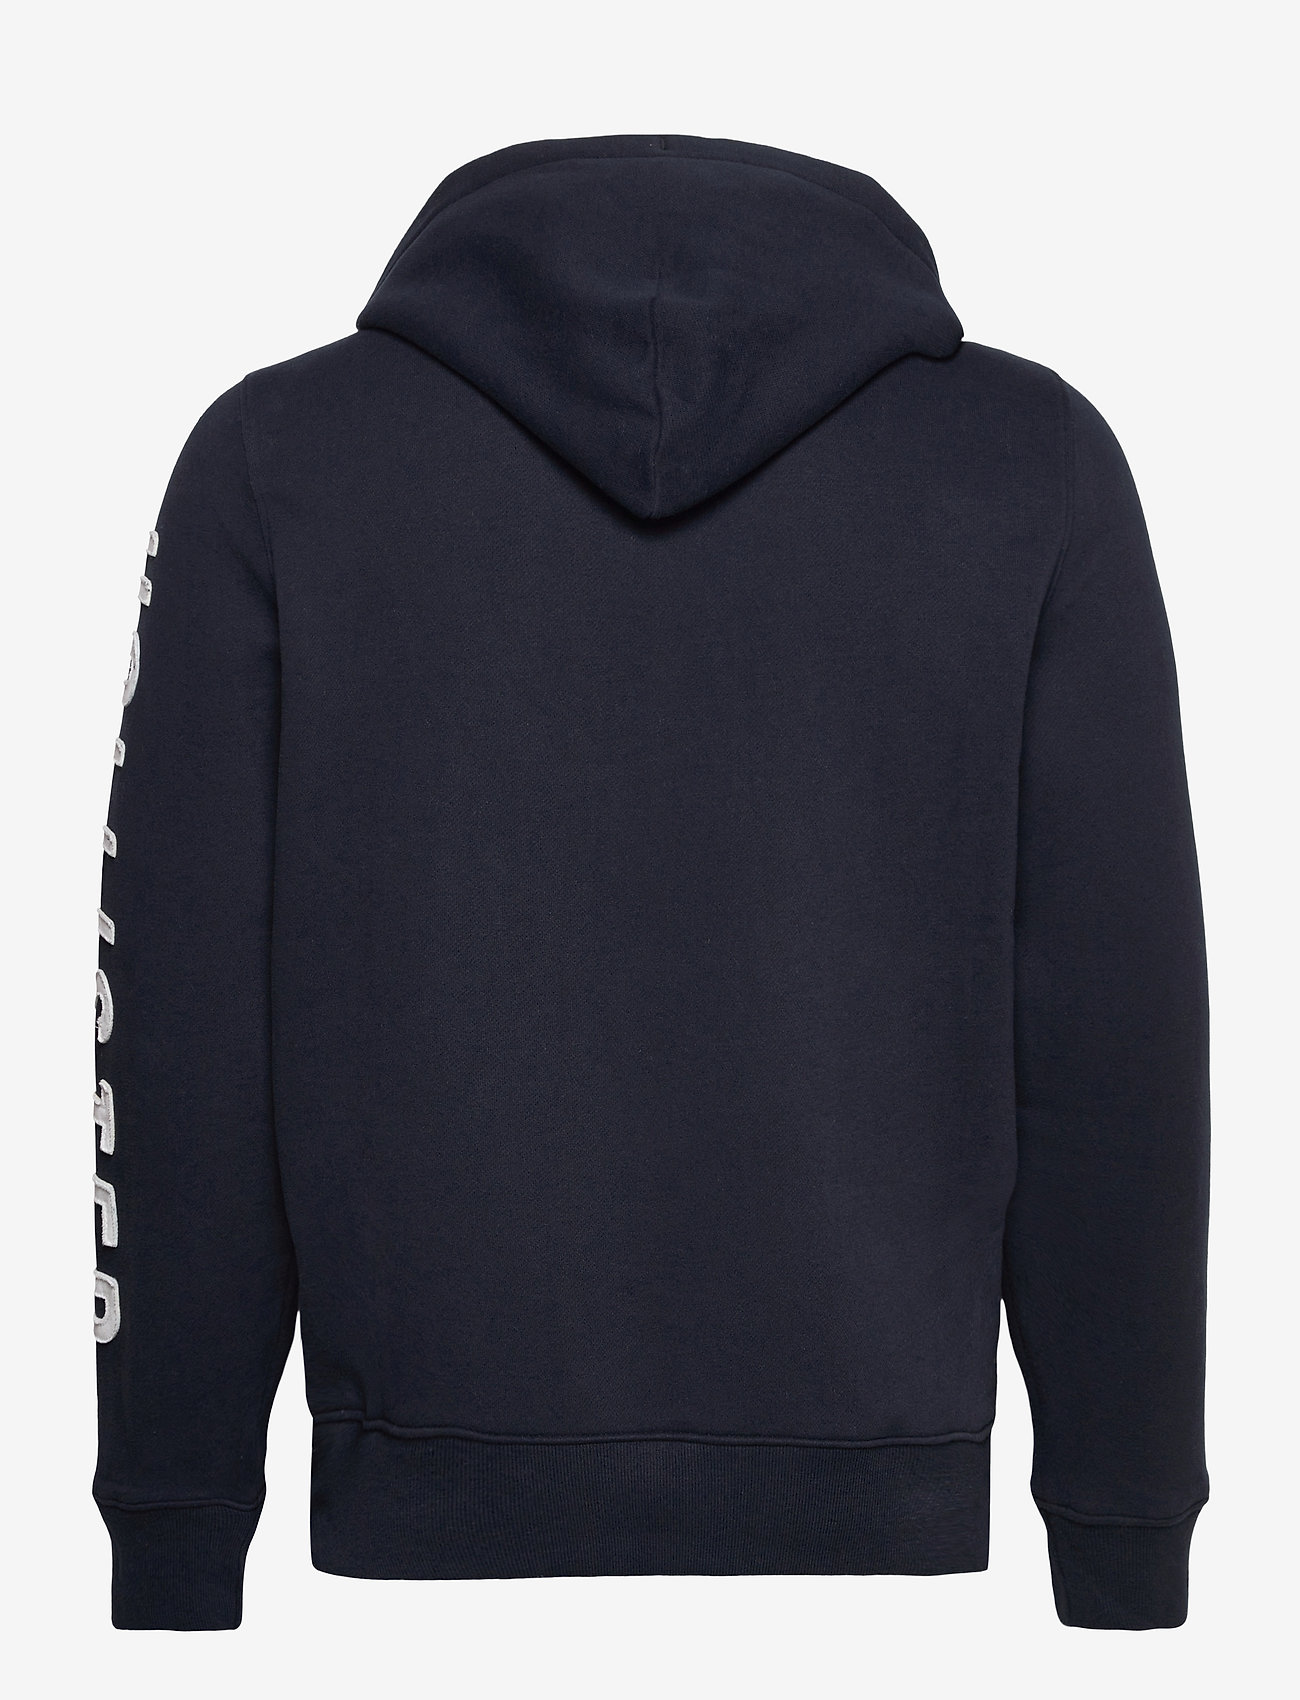 Hollister HCo. GUYS SWEATSHIRTS - Sweatshirts NAVY DD - Menn Klær